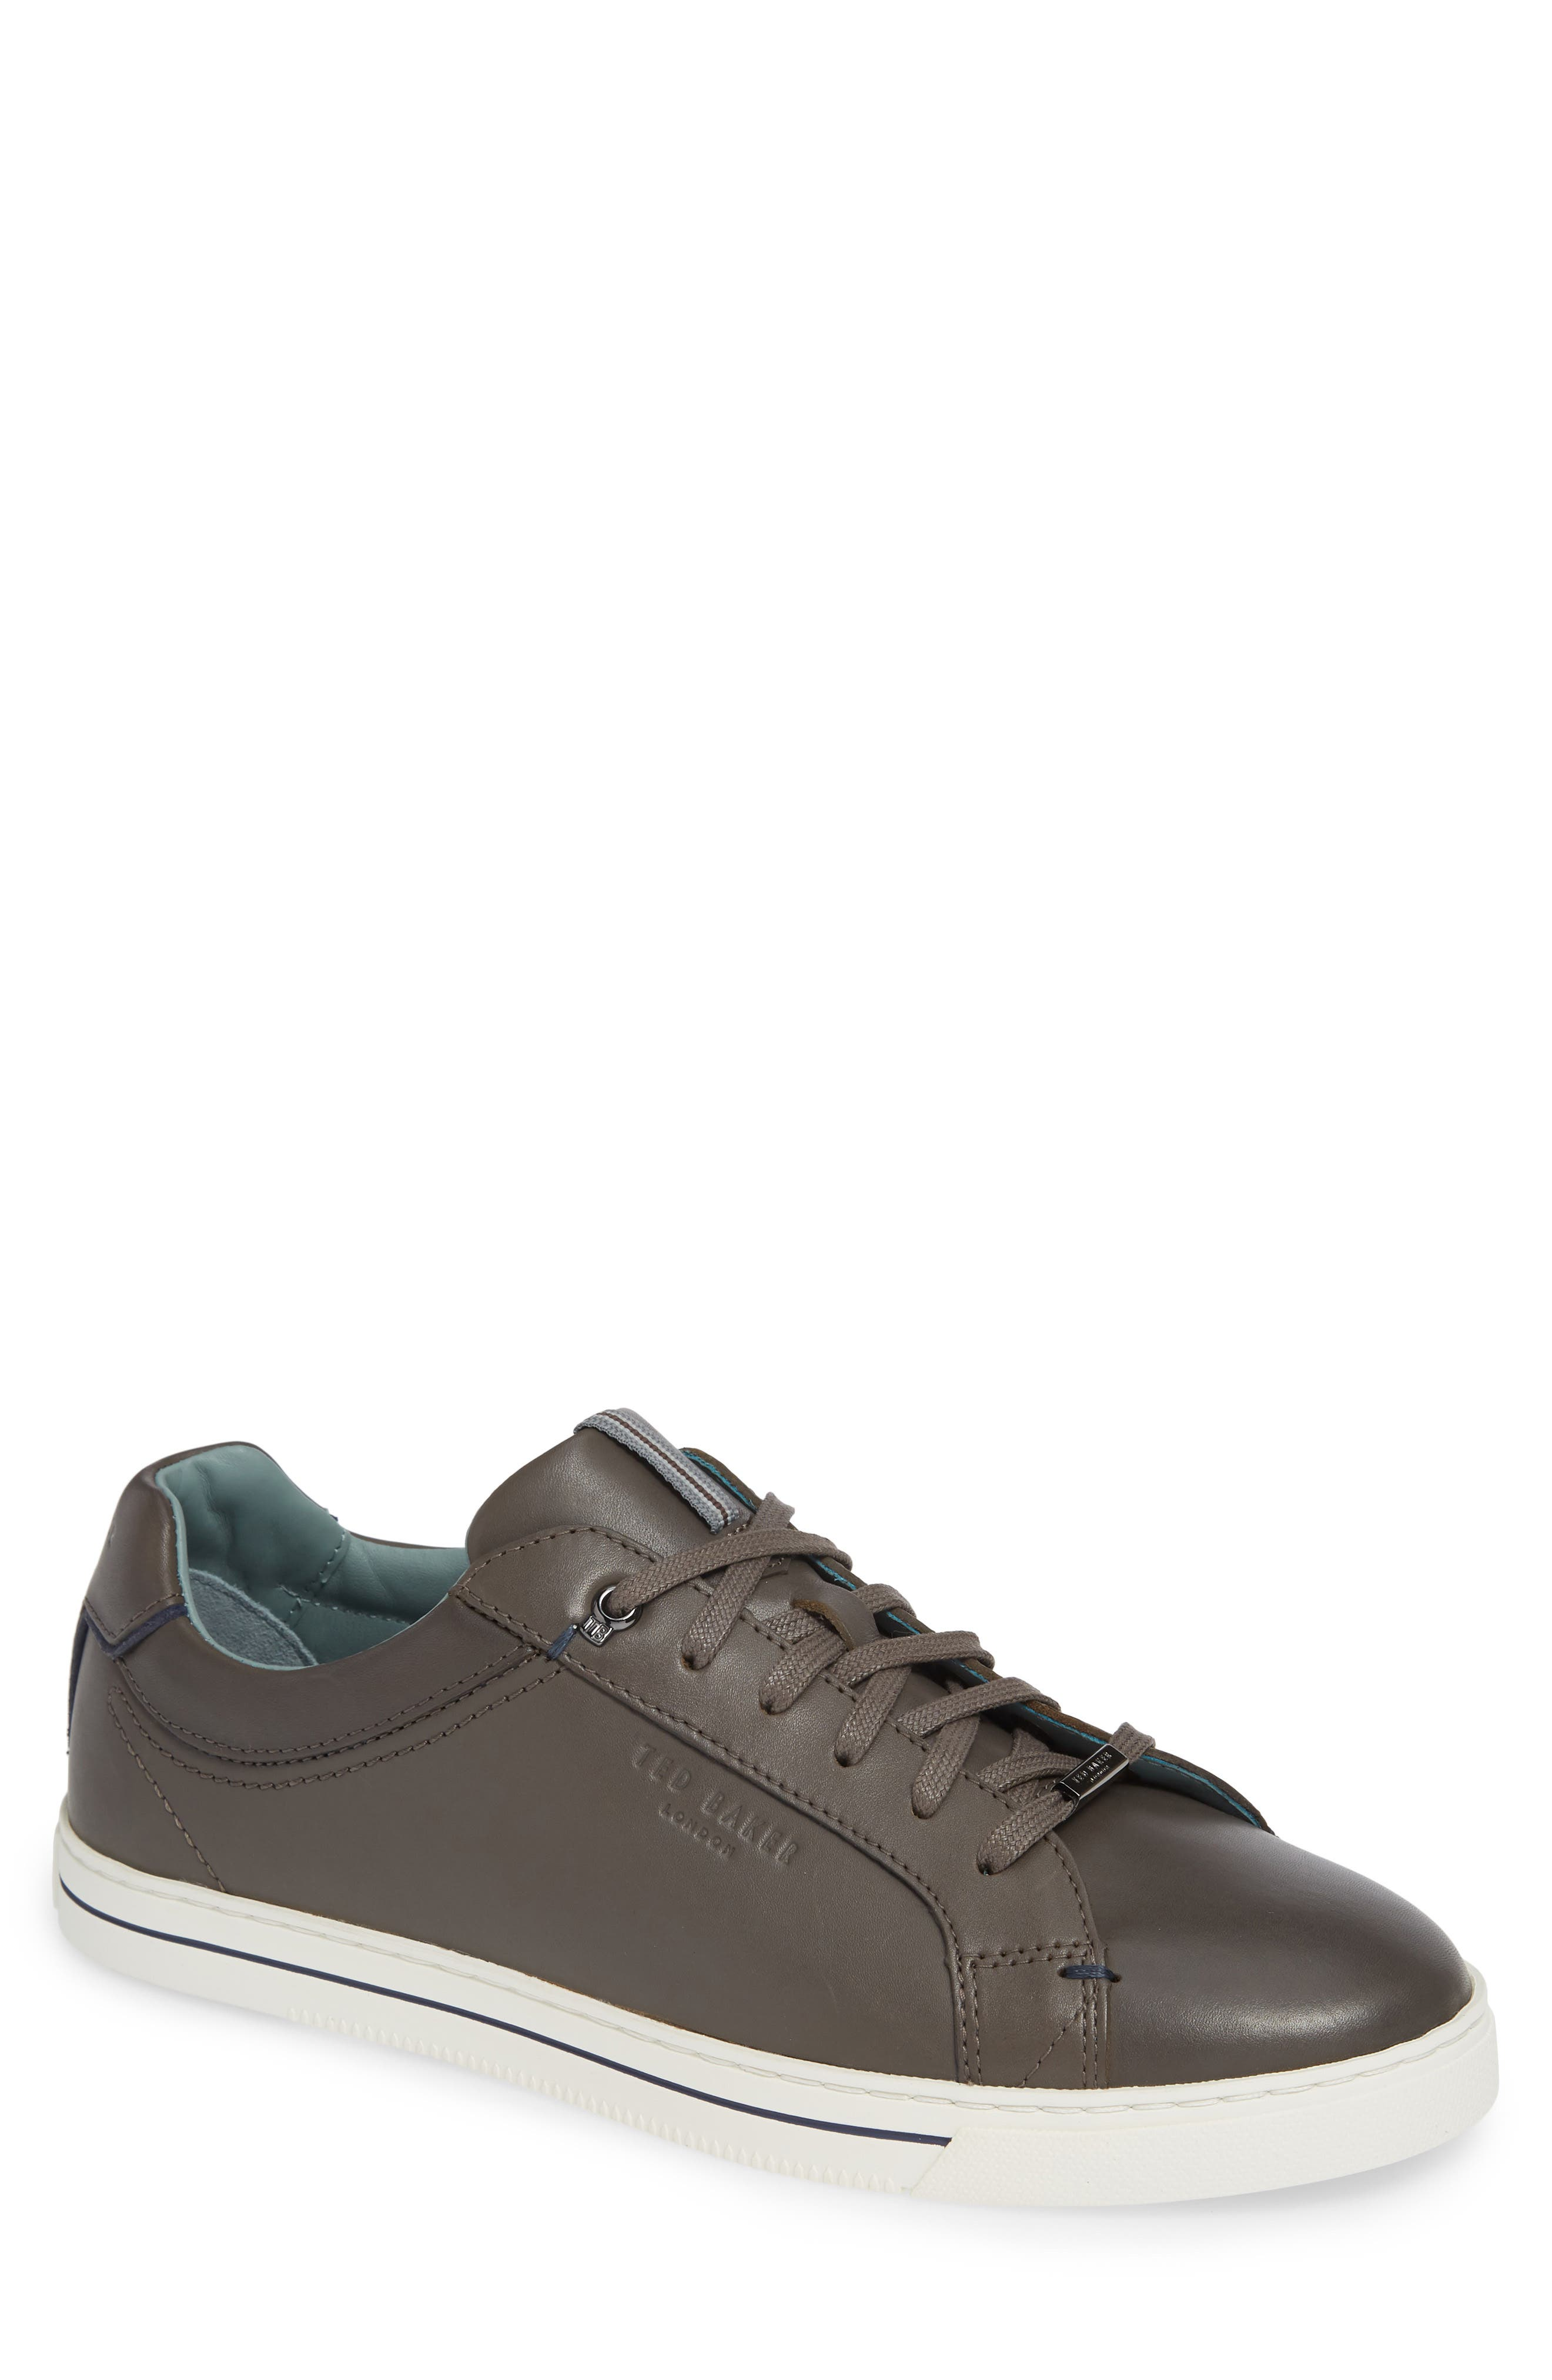 Thawne Sneaker,                         Main,                         color, DARK GREY LEATHER